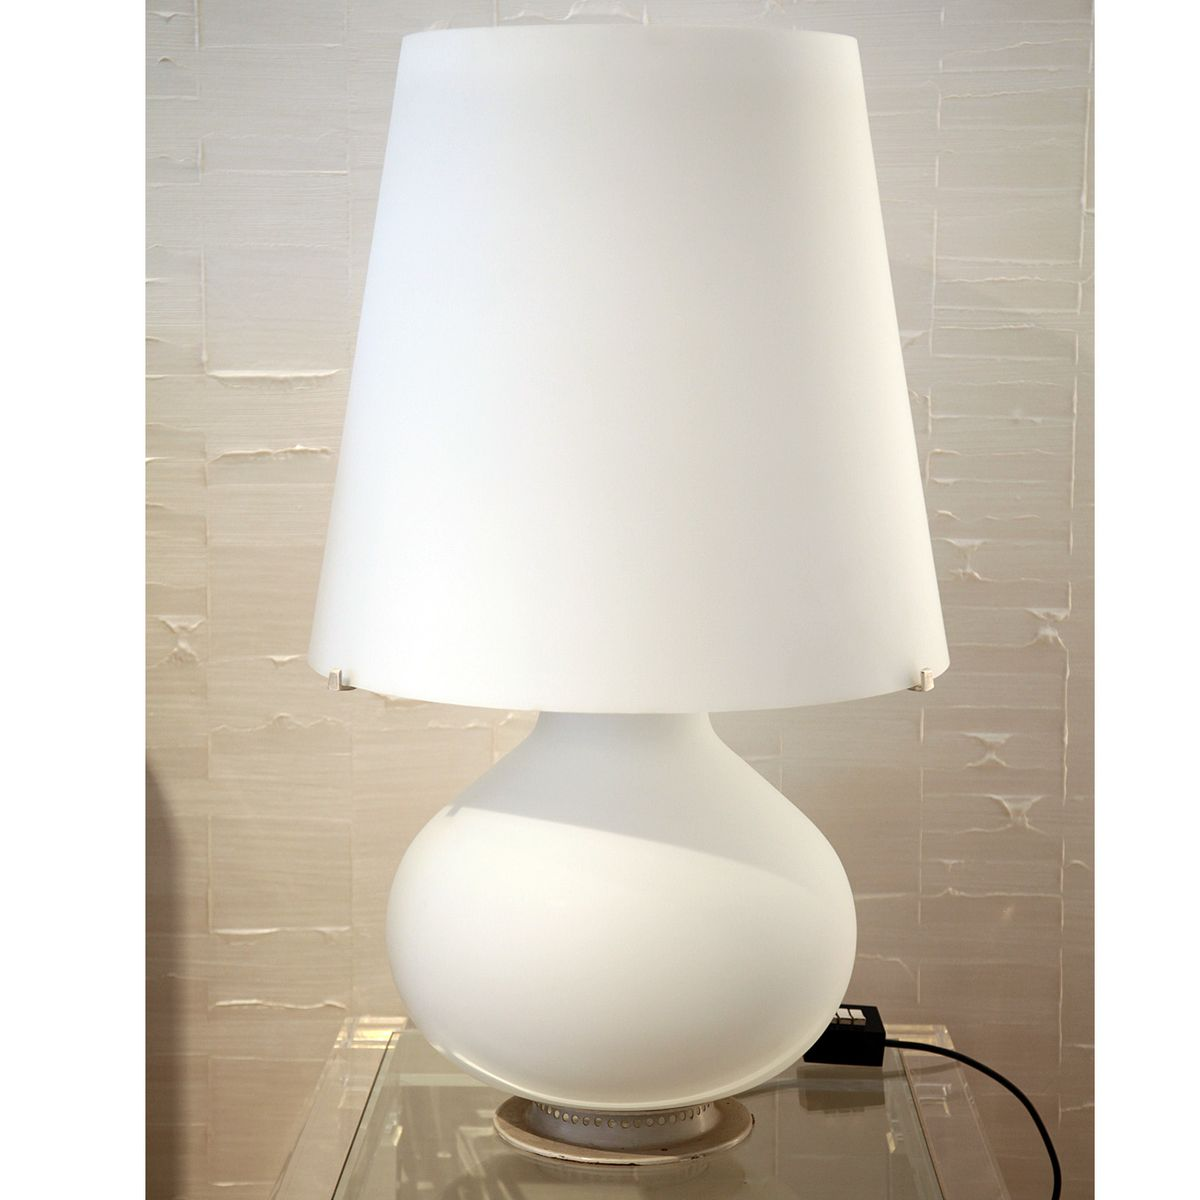 fontana 1853 1 tischlampe von max ingrand f r fontana arte 1950er bei pamono kaufen. Black Bedroom Furniture Sets. Home Design Ideas